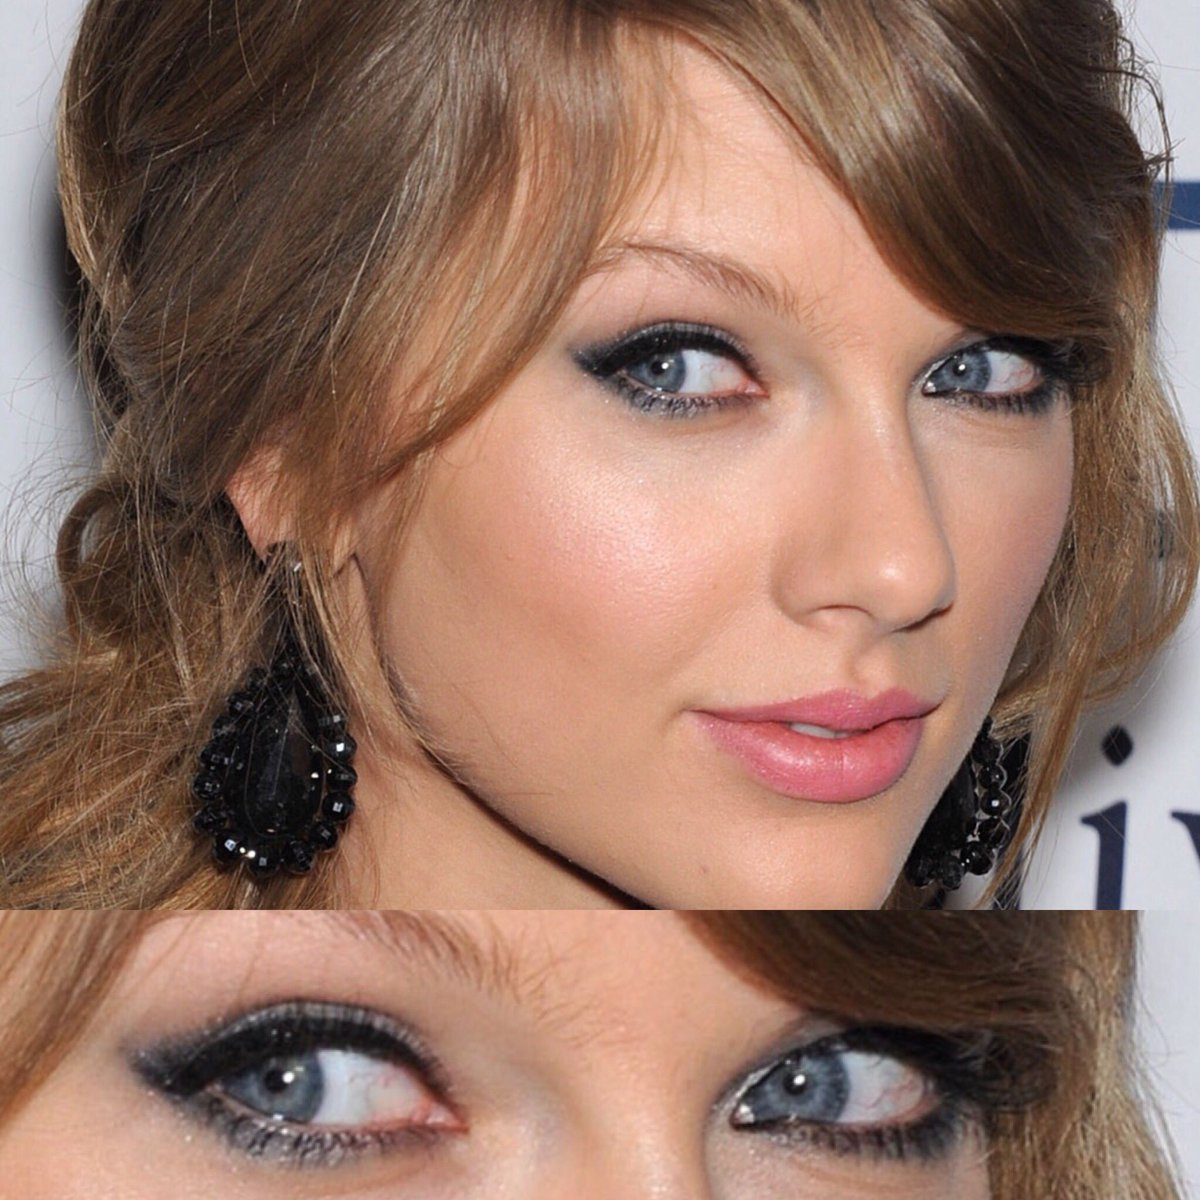 Which eye makeup? Vote below! #TaylorSwiftNOW #TaylorSwift #Swifties #makeup #eyeliner #eyeshadow #mascara<br>http://pic.twitter.com/edZVwpqQGJ